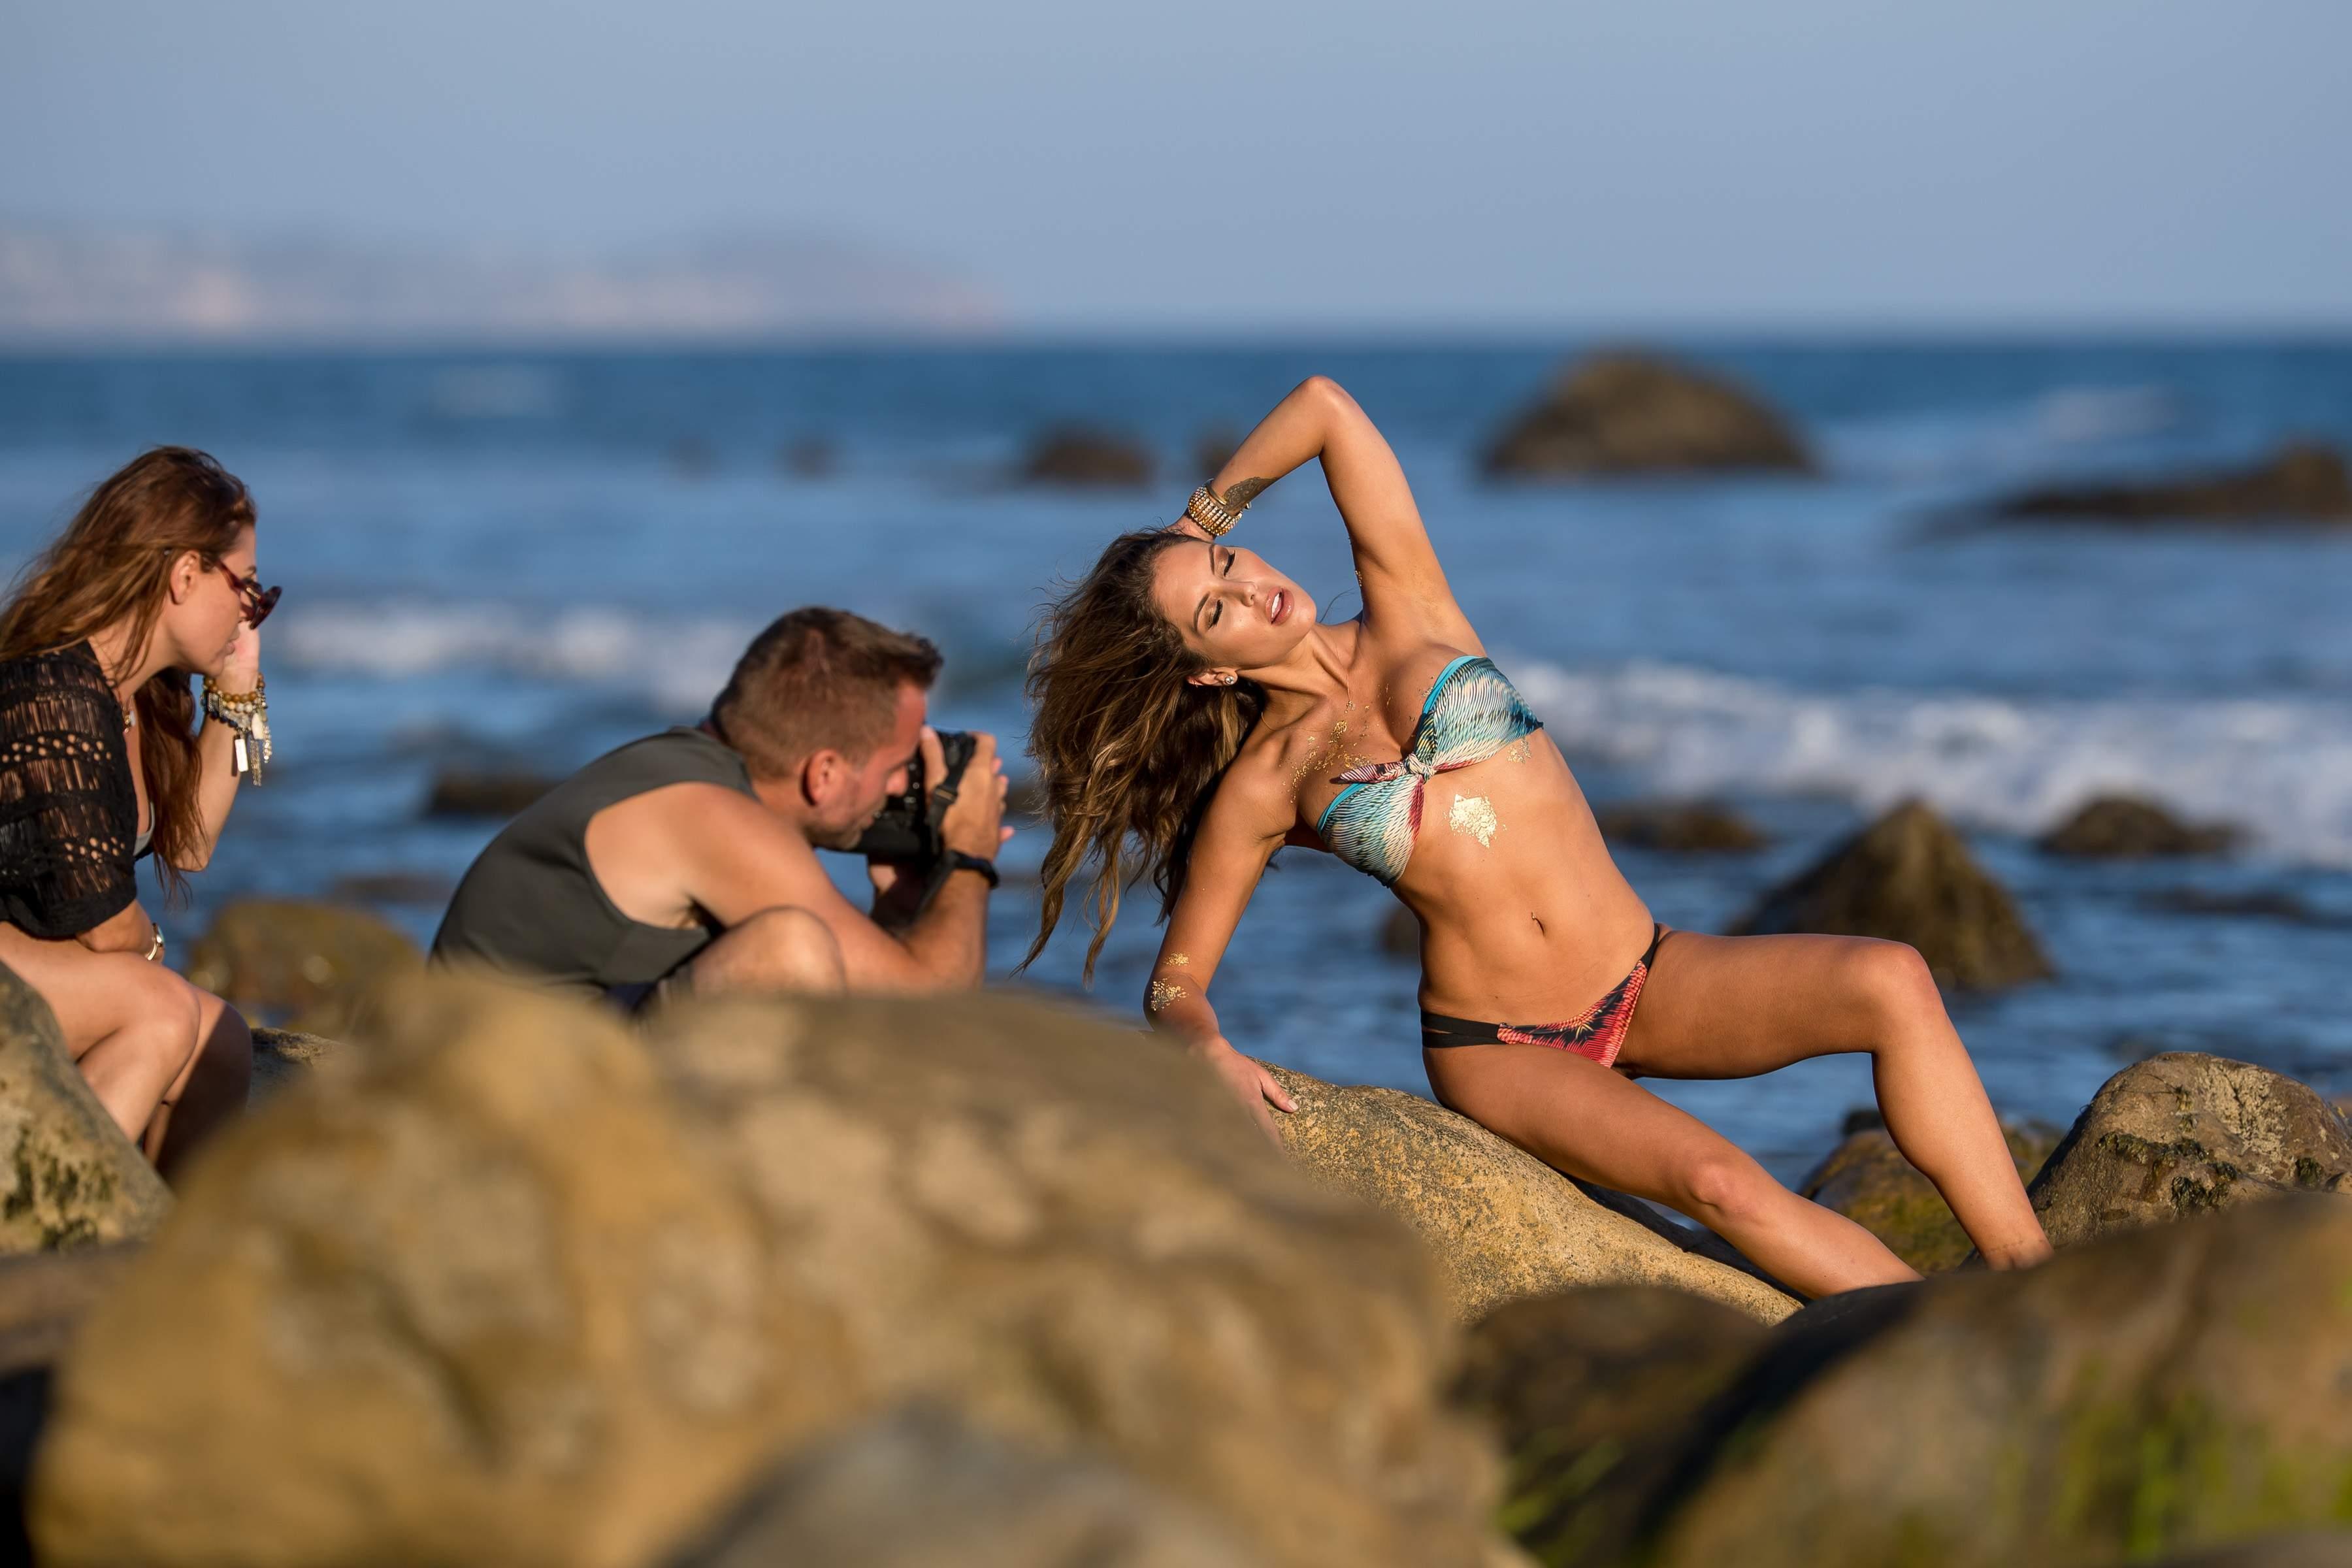 Brittney-Palmer-Sexy-13-thefappeningblog.com_.jpg